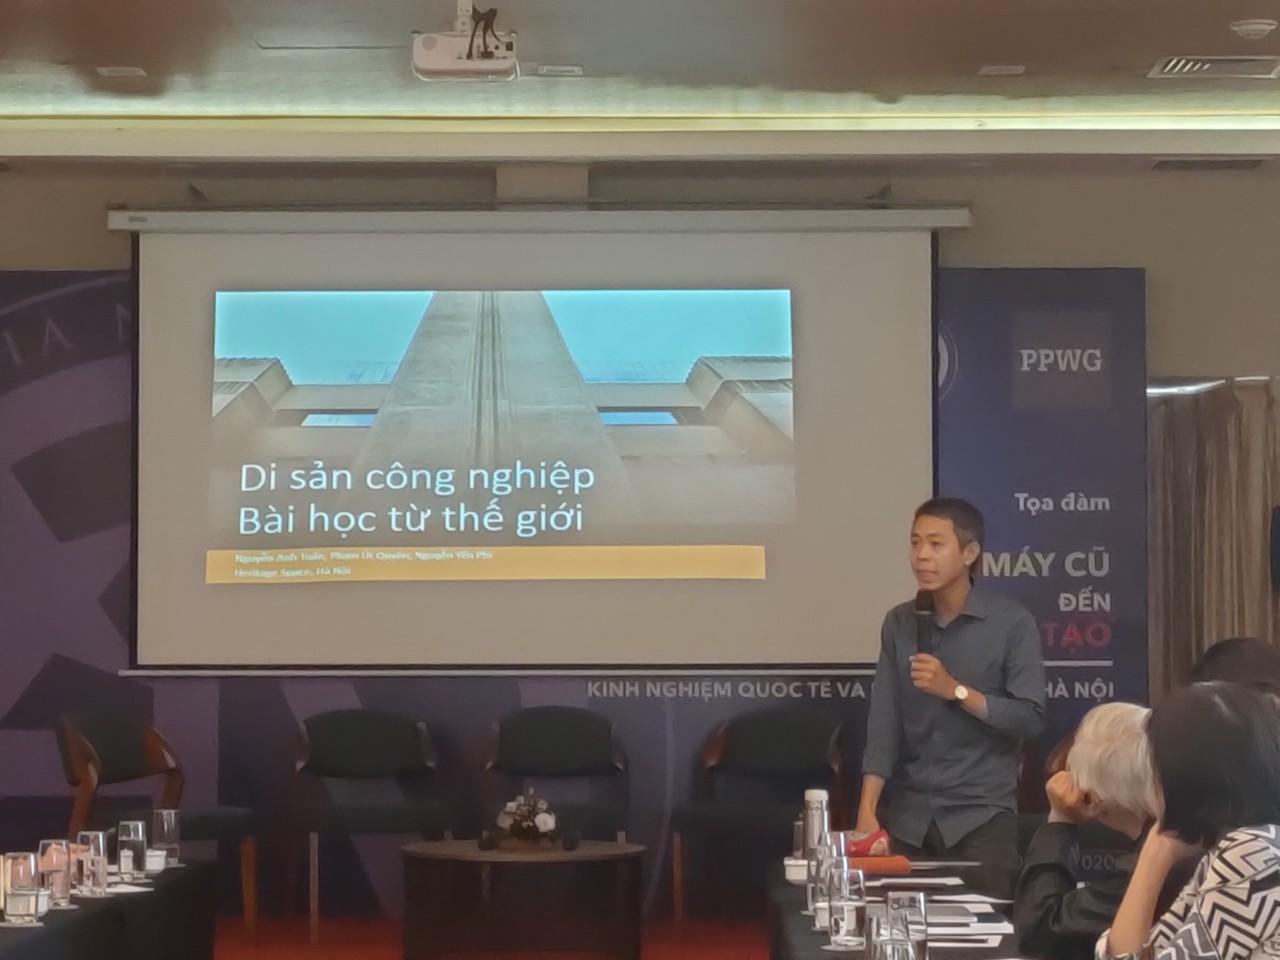 Diễn giả Nguyễn Anh Tuấn